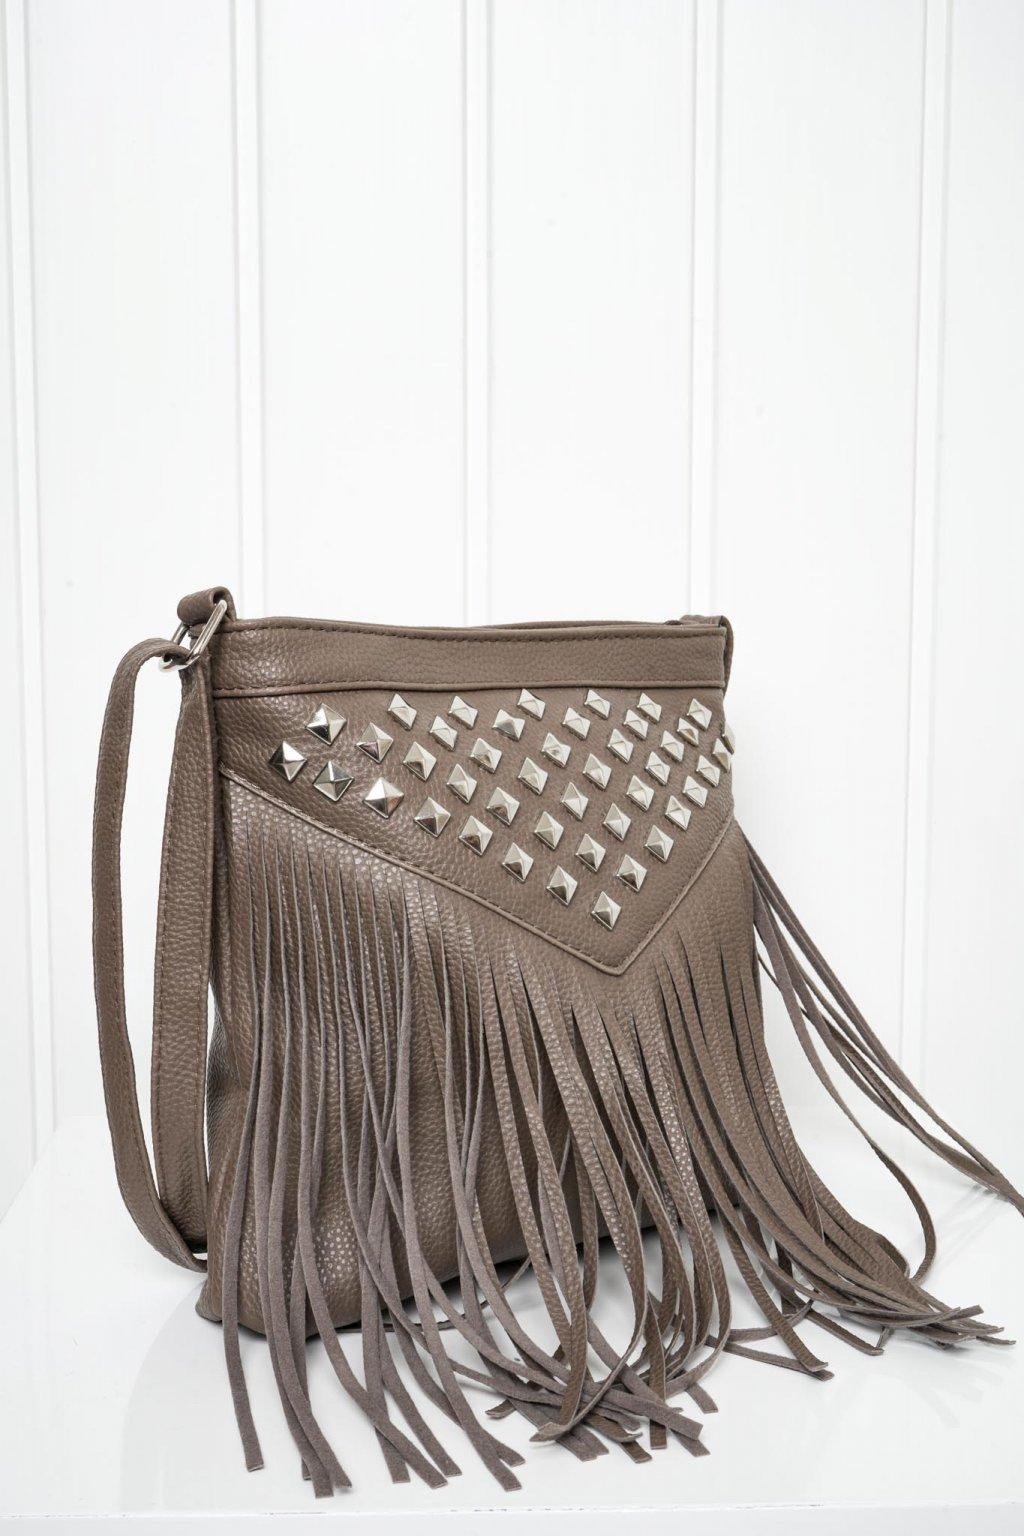 Kabelka, crossbody, ruksak, shopping bag, shopperka, 115